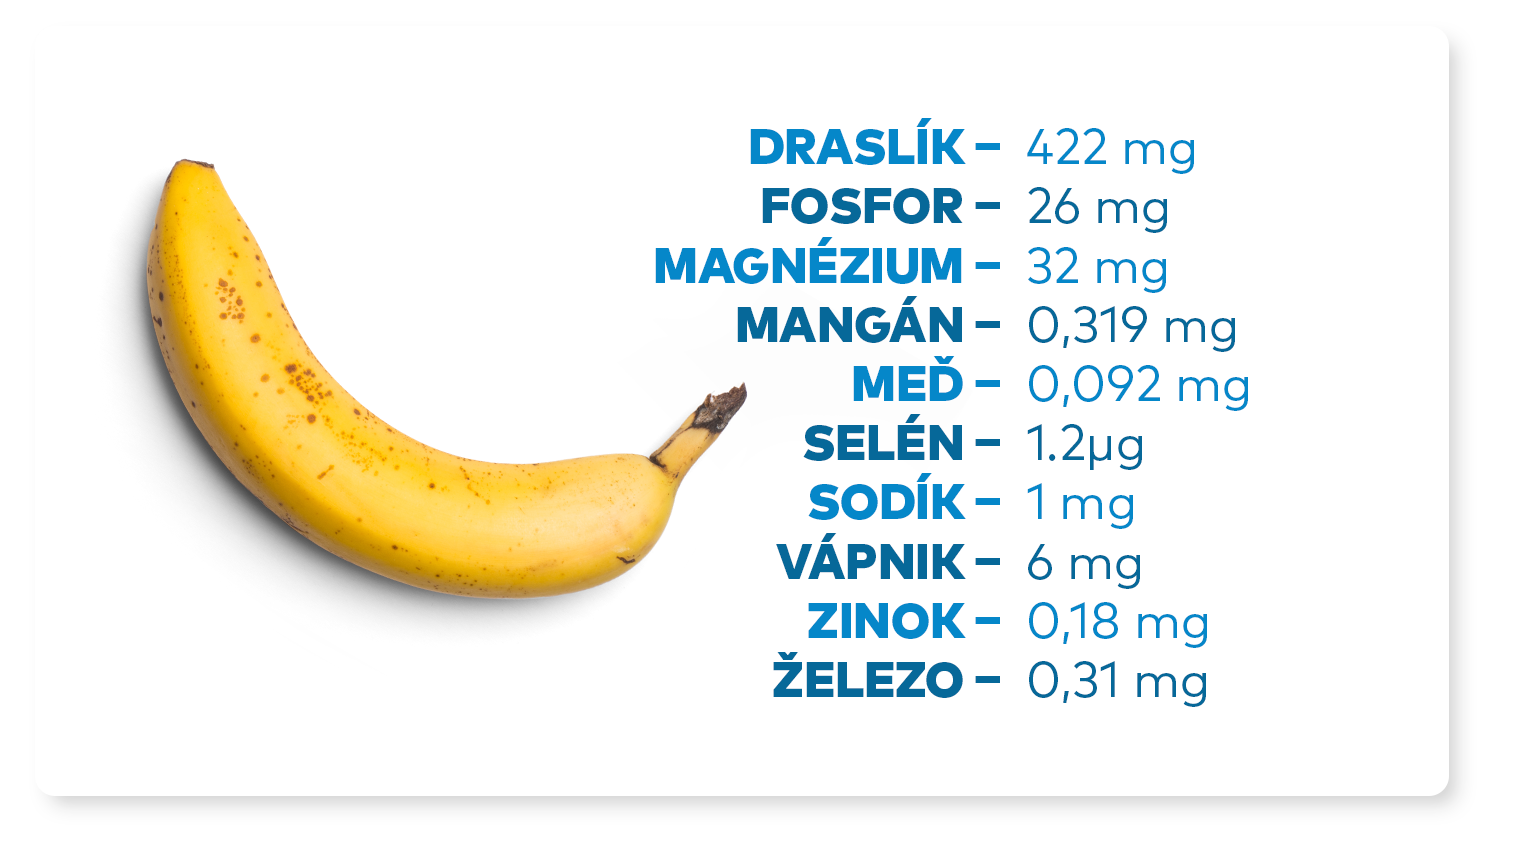 mineraly v banane